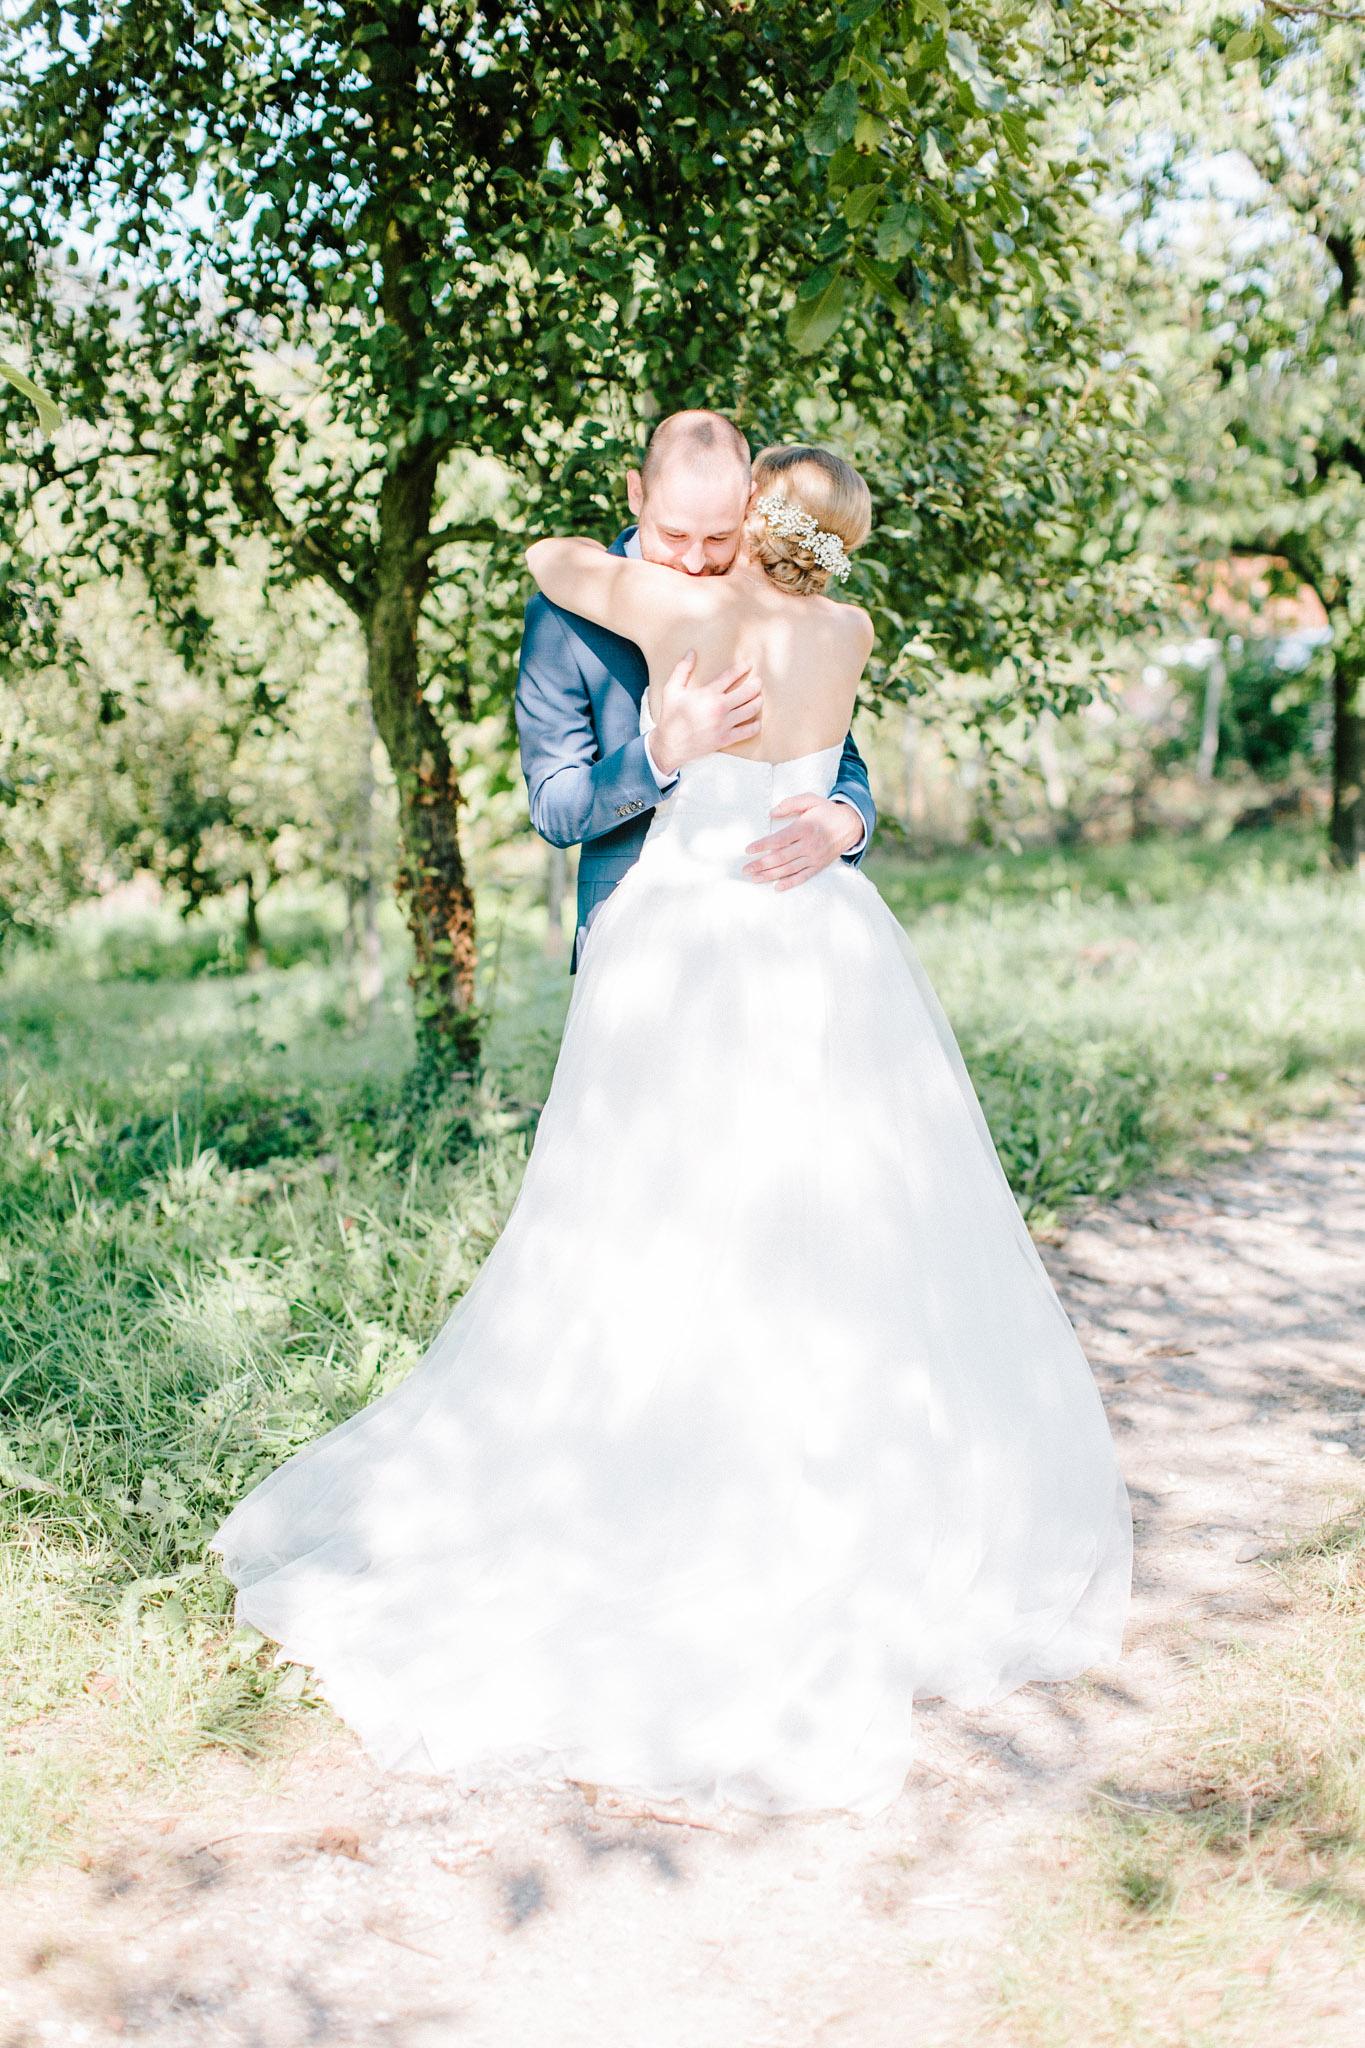 Lilienhof-Freiburg-Hochzeit-Pia-Anna-Christian-Wedding-Photography-FS-29.jpg